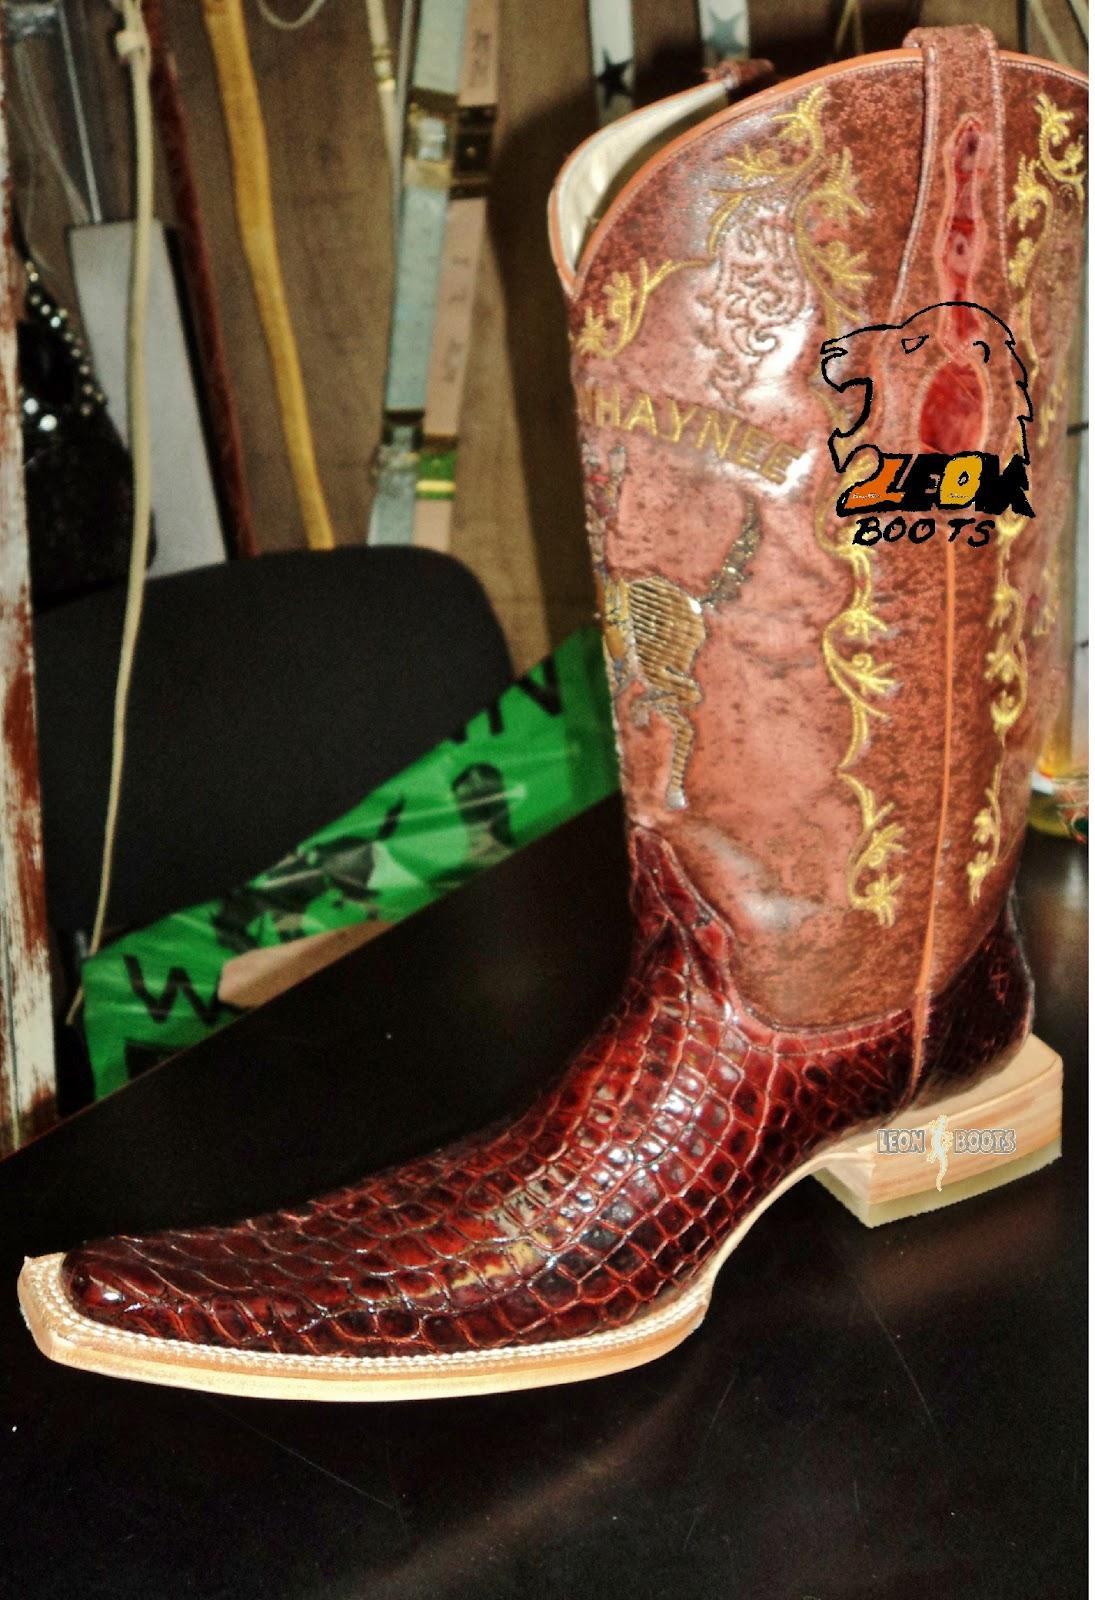 c4b4b33ea6 Leon Boots Botas Vaqueras Related Keywords   Suggestions - Leon ...